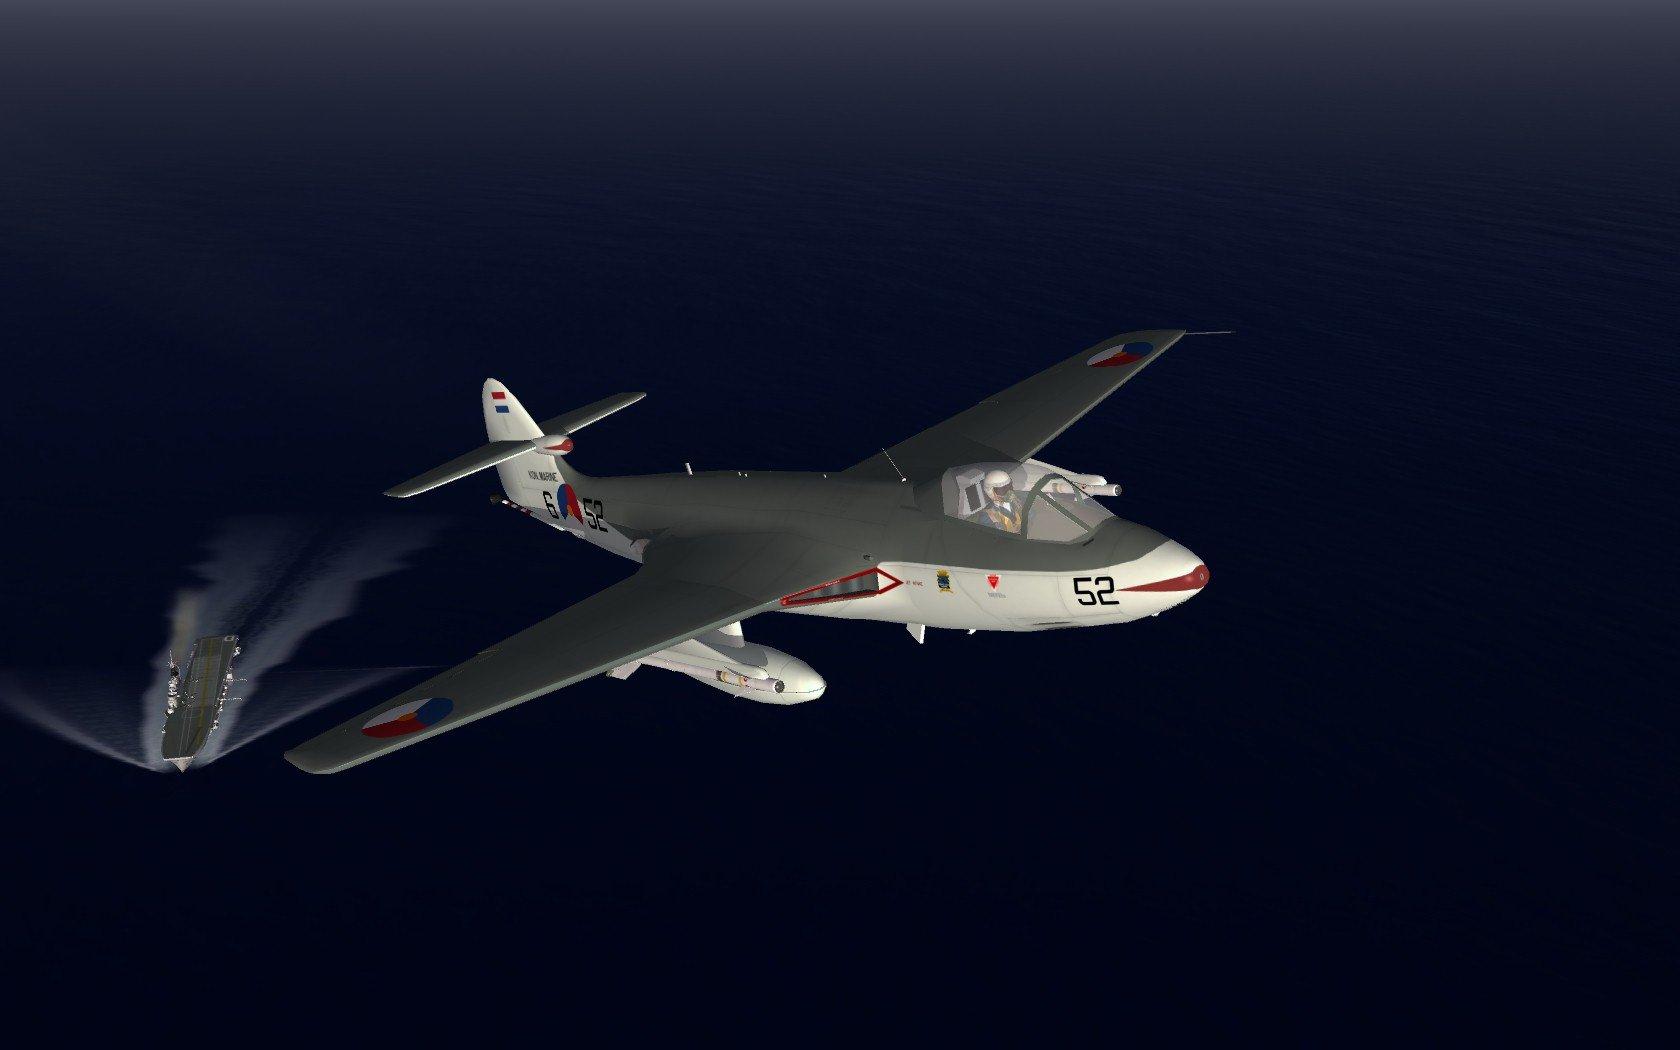 SeaHawk Mk-50 + HNLMS Karel Doorman combo